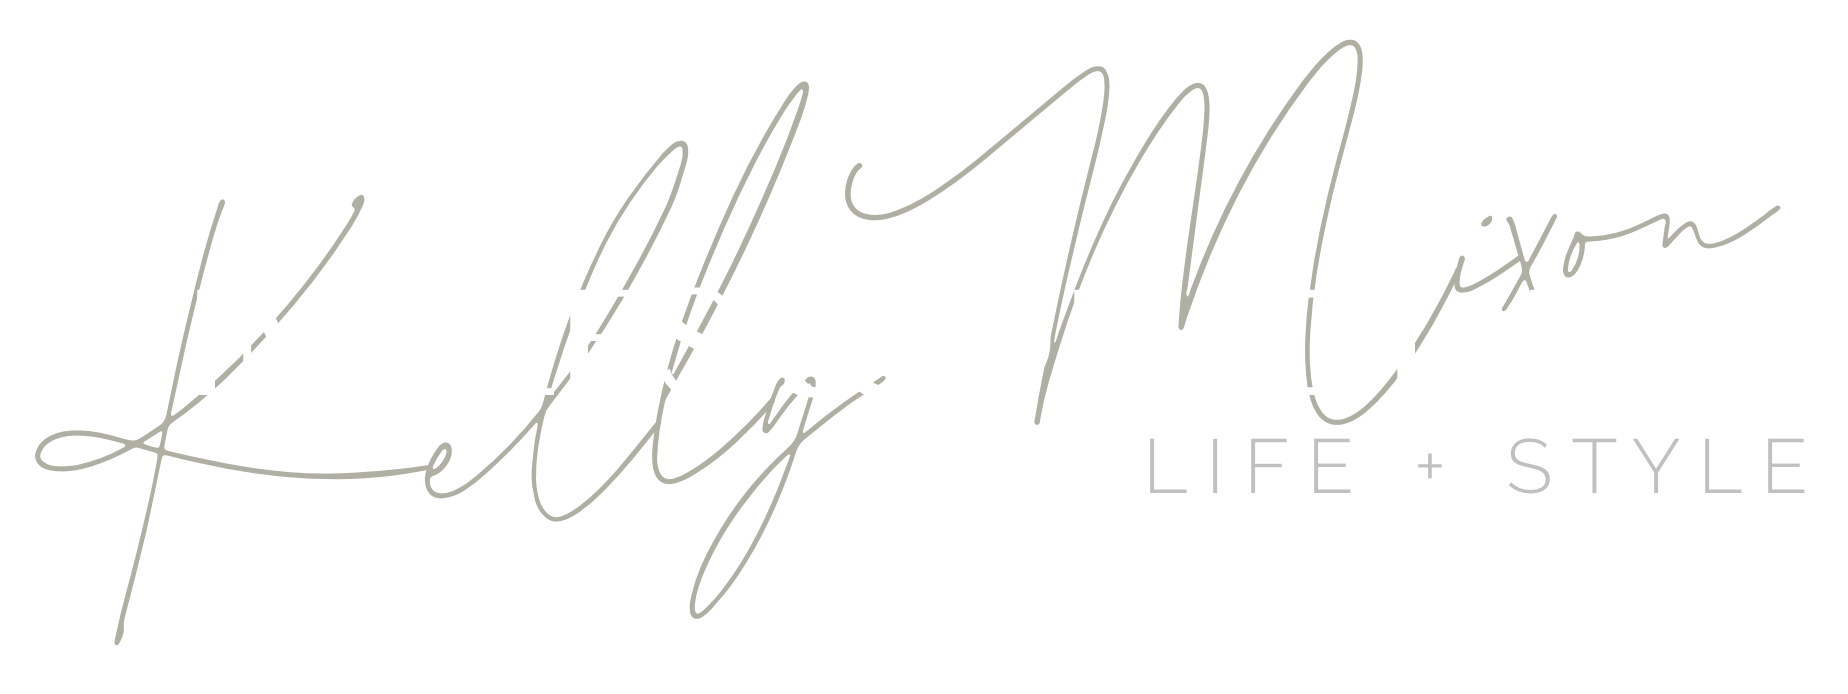 Dimples & Deadlines